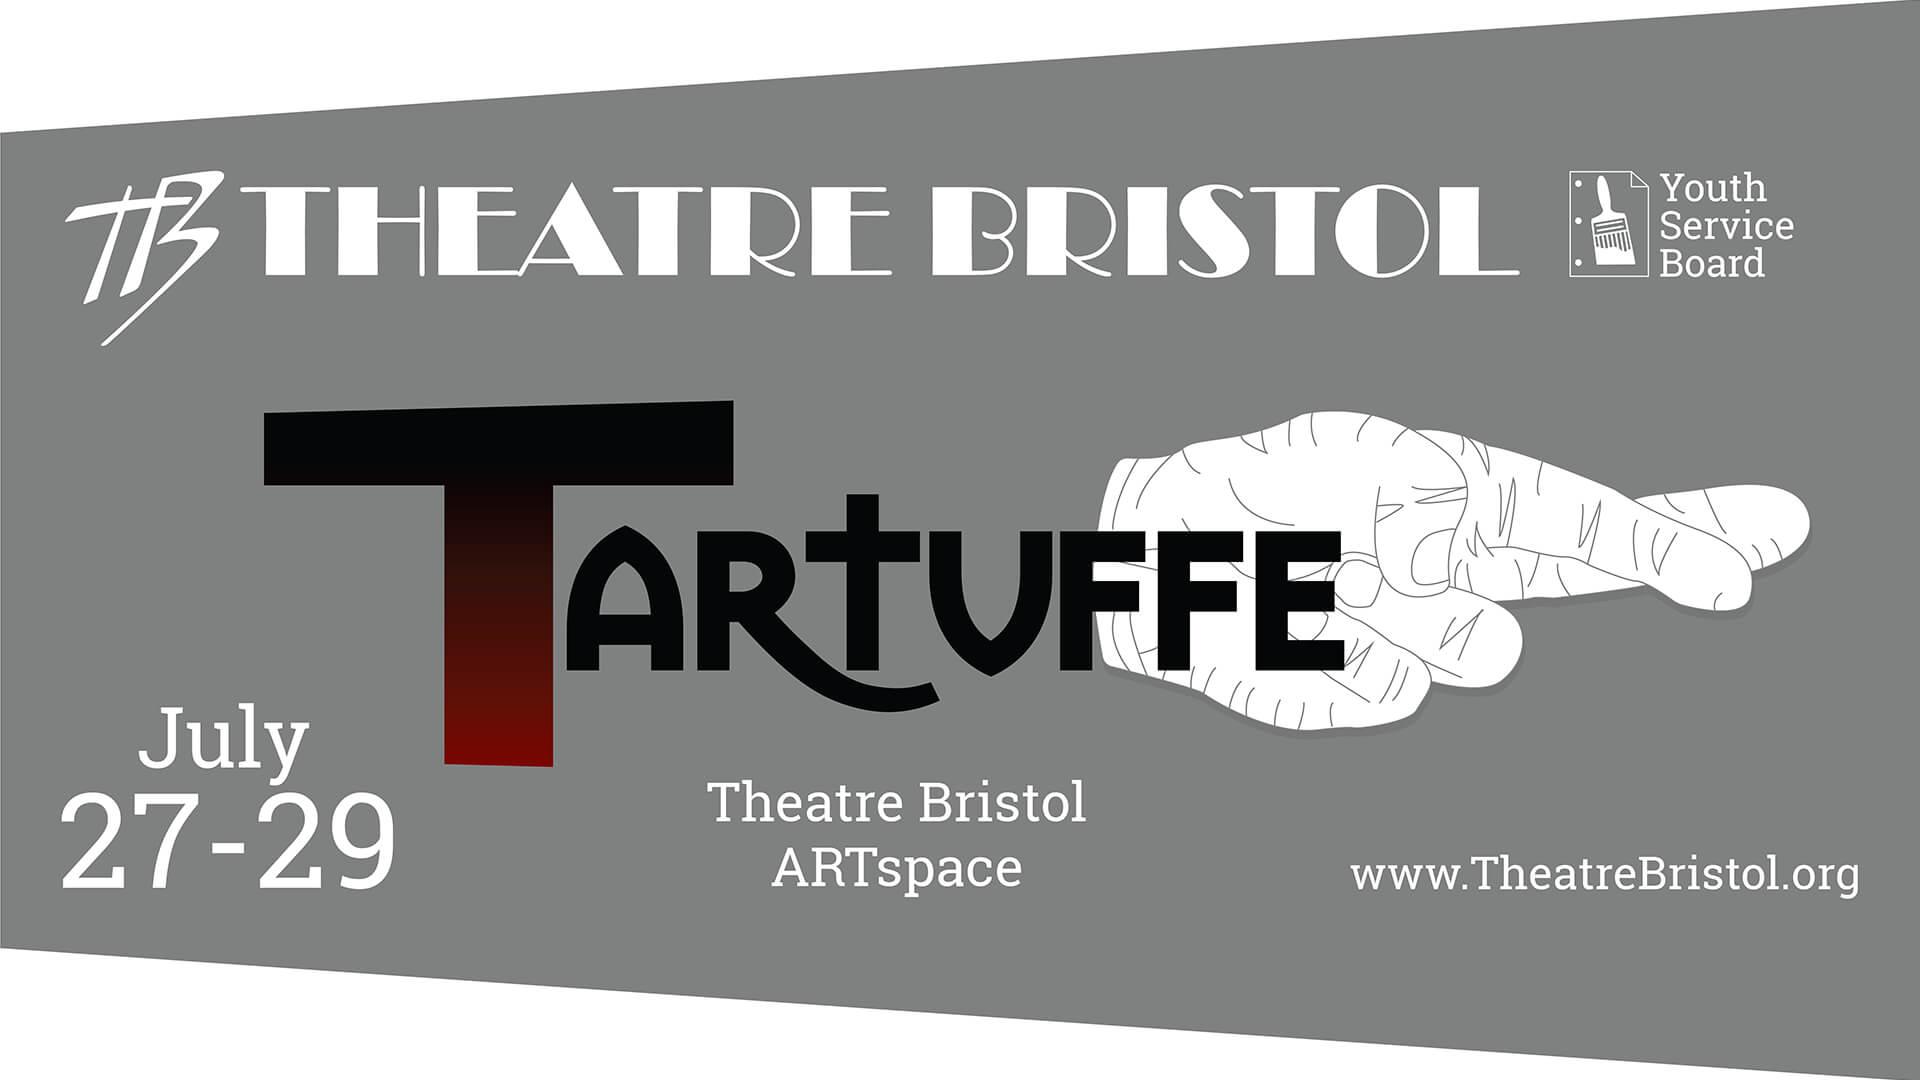 Tartuffe At Theatre Bristol Downtown Bristol Events Believe In